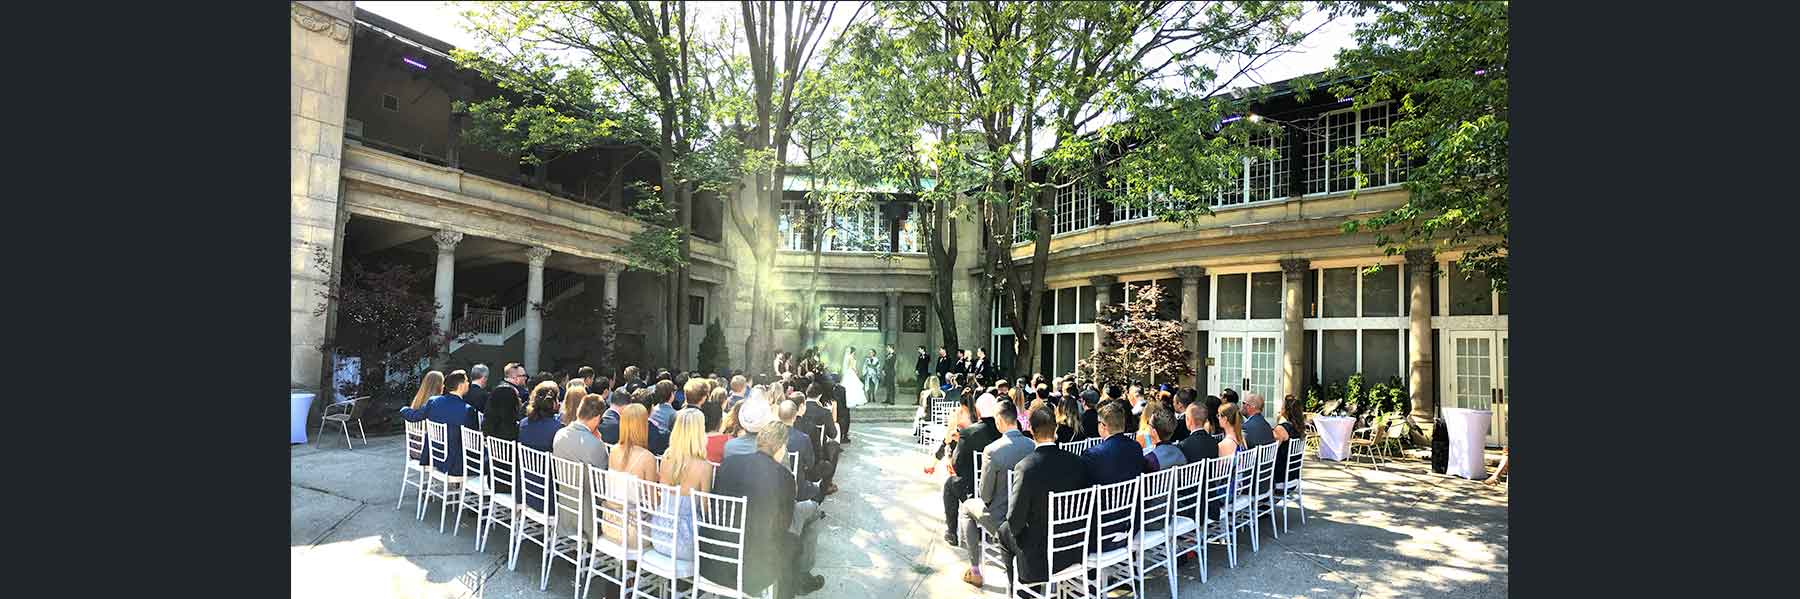 Libert-Grand-Toronto-Wedding-Ceremony-DJ-Services